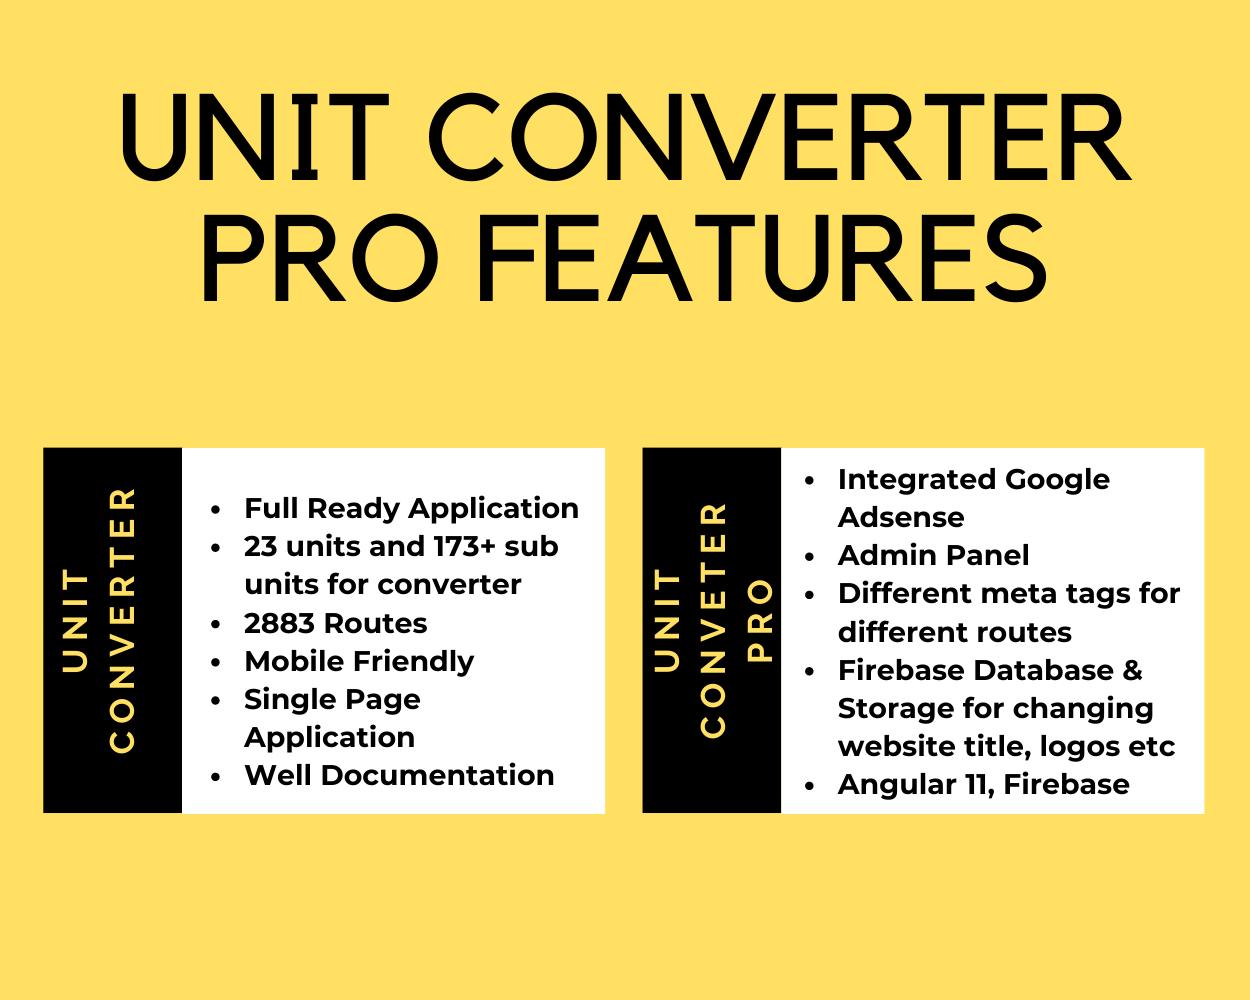 Online Unit Converter PRO Tools Full Production Ready Application (Angular 11) - 1